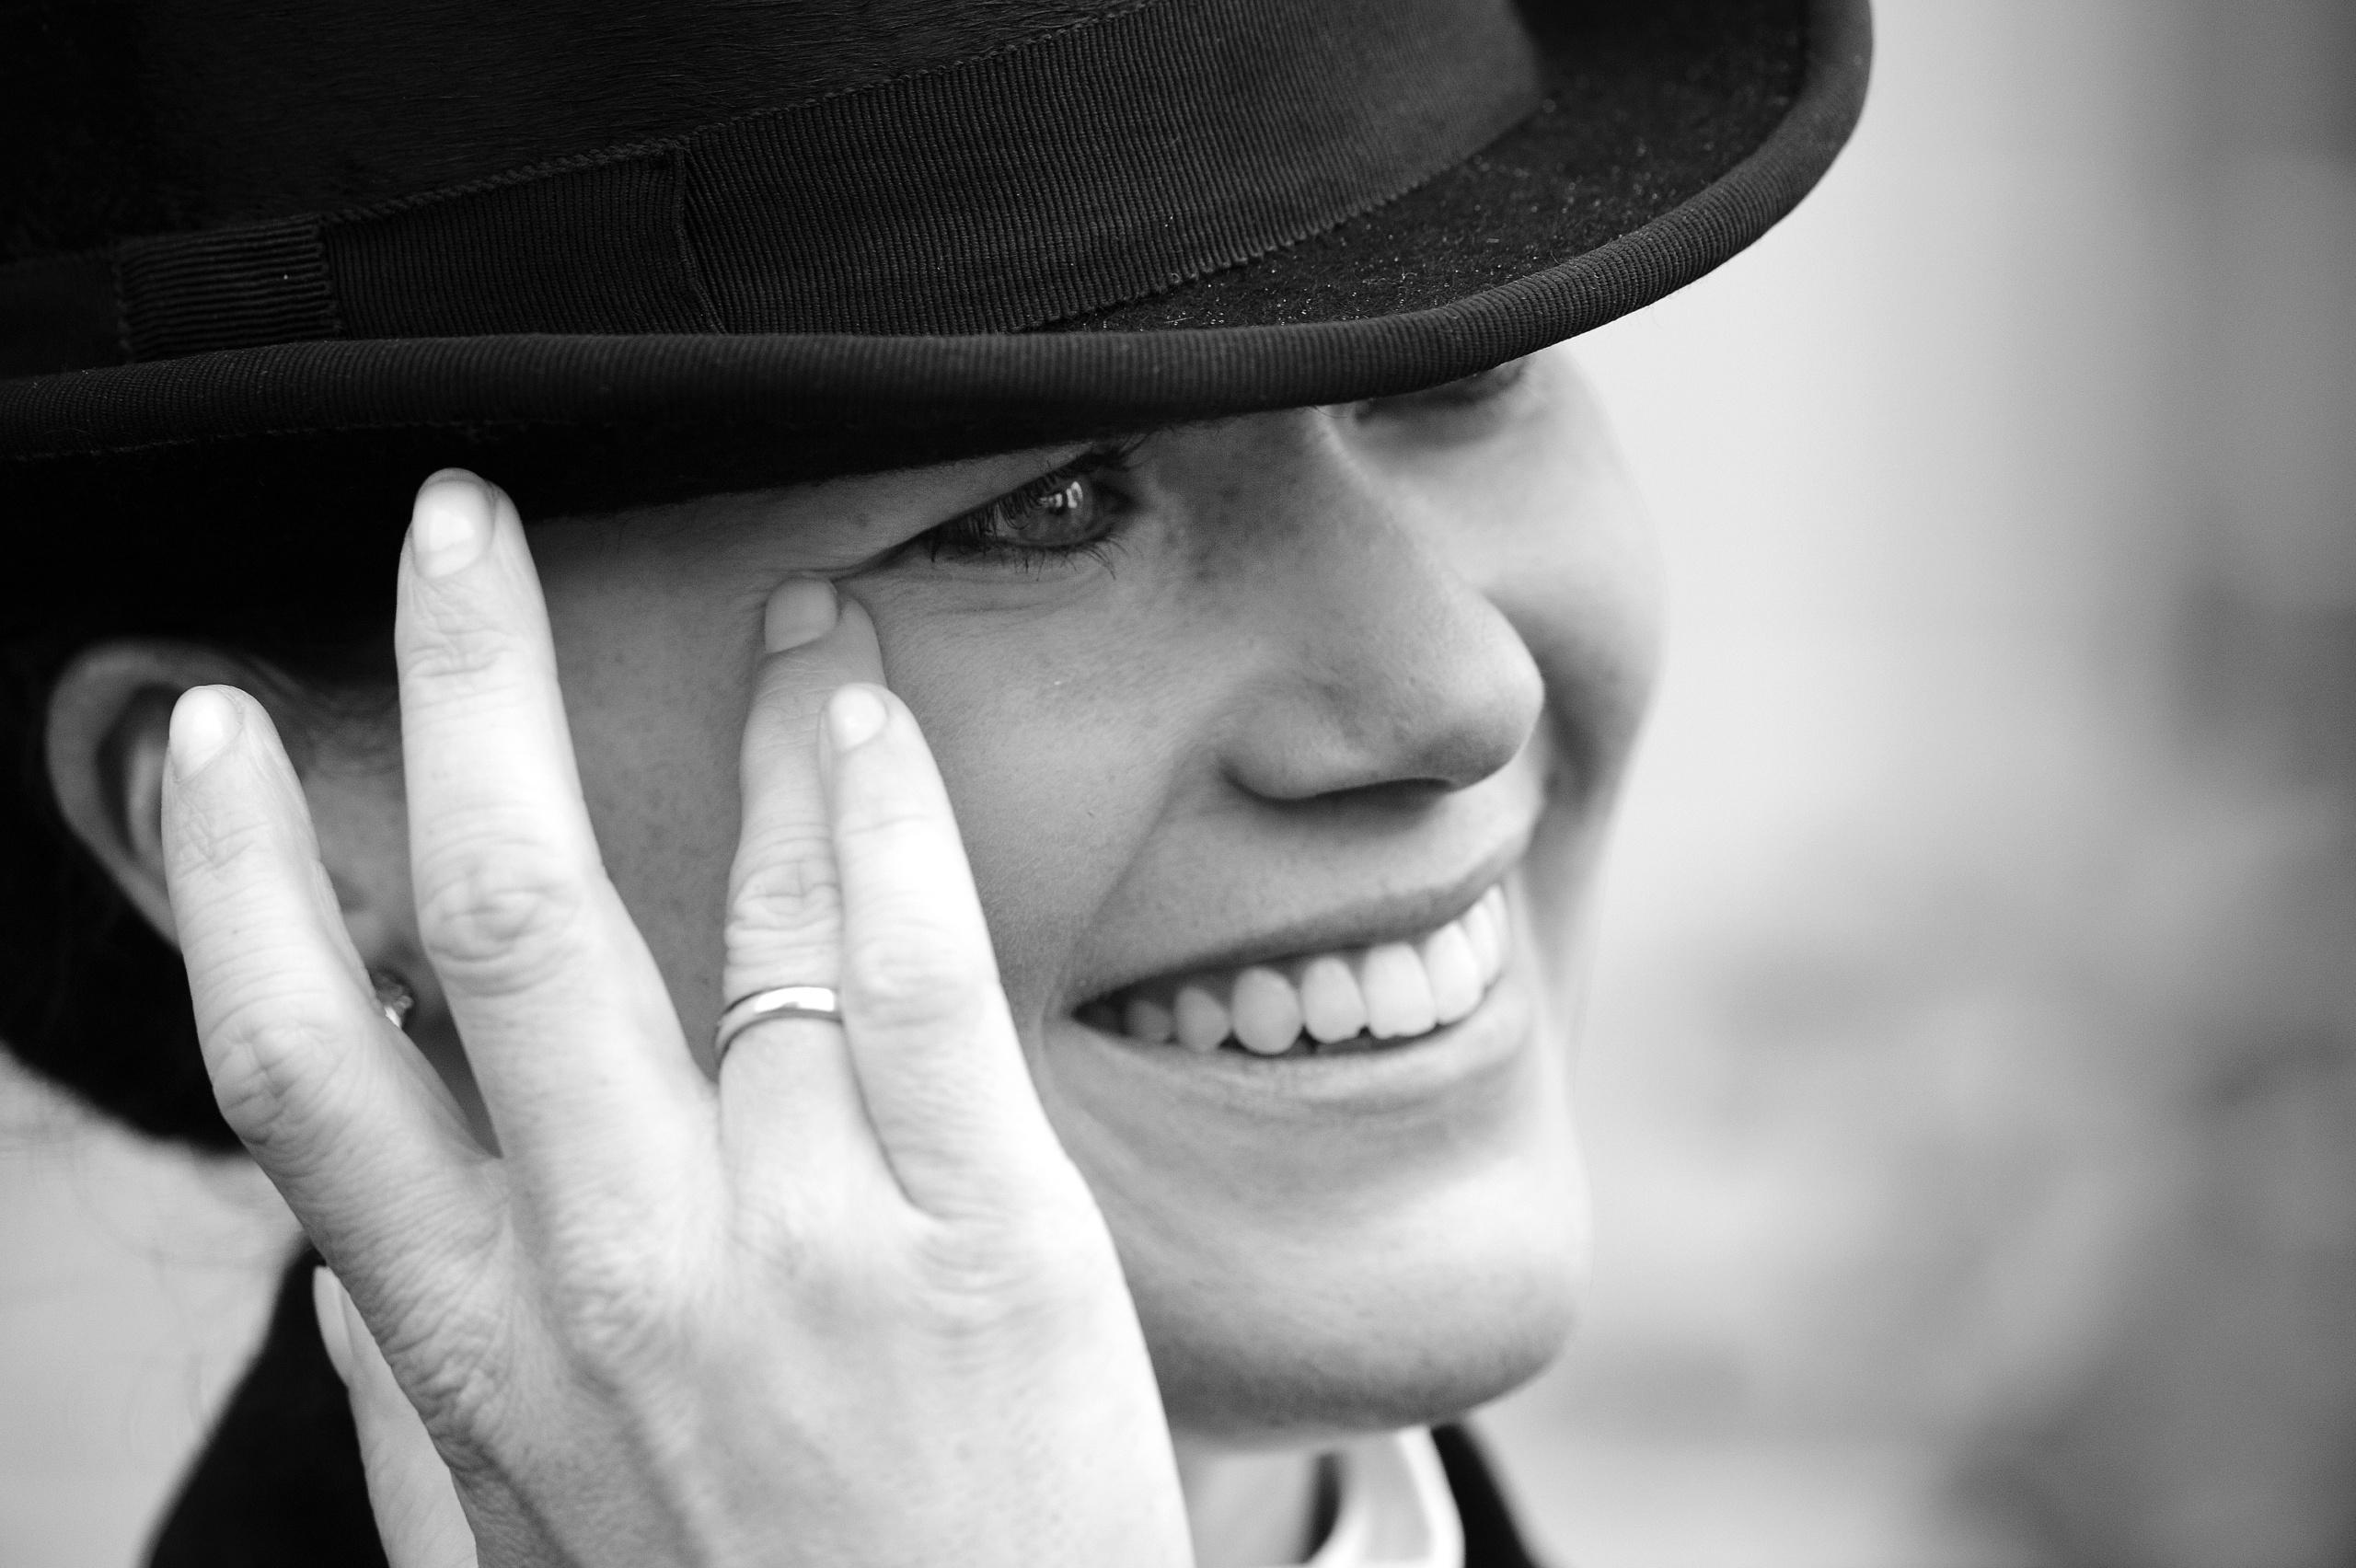 FEI EUROPEAN CHAMPIONSHIPS Aachen 2015.Individual Final Grand Prix Freestyle DressageRider. Kristina BRÖRINGS-SPREHEHorse. DESPERADOS FRH